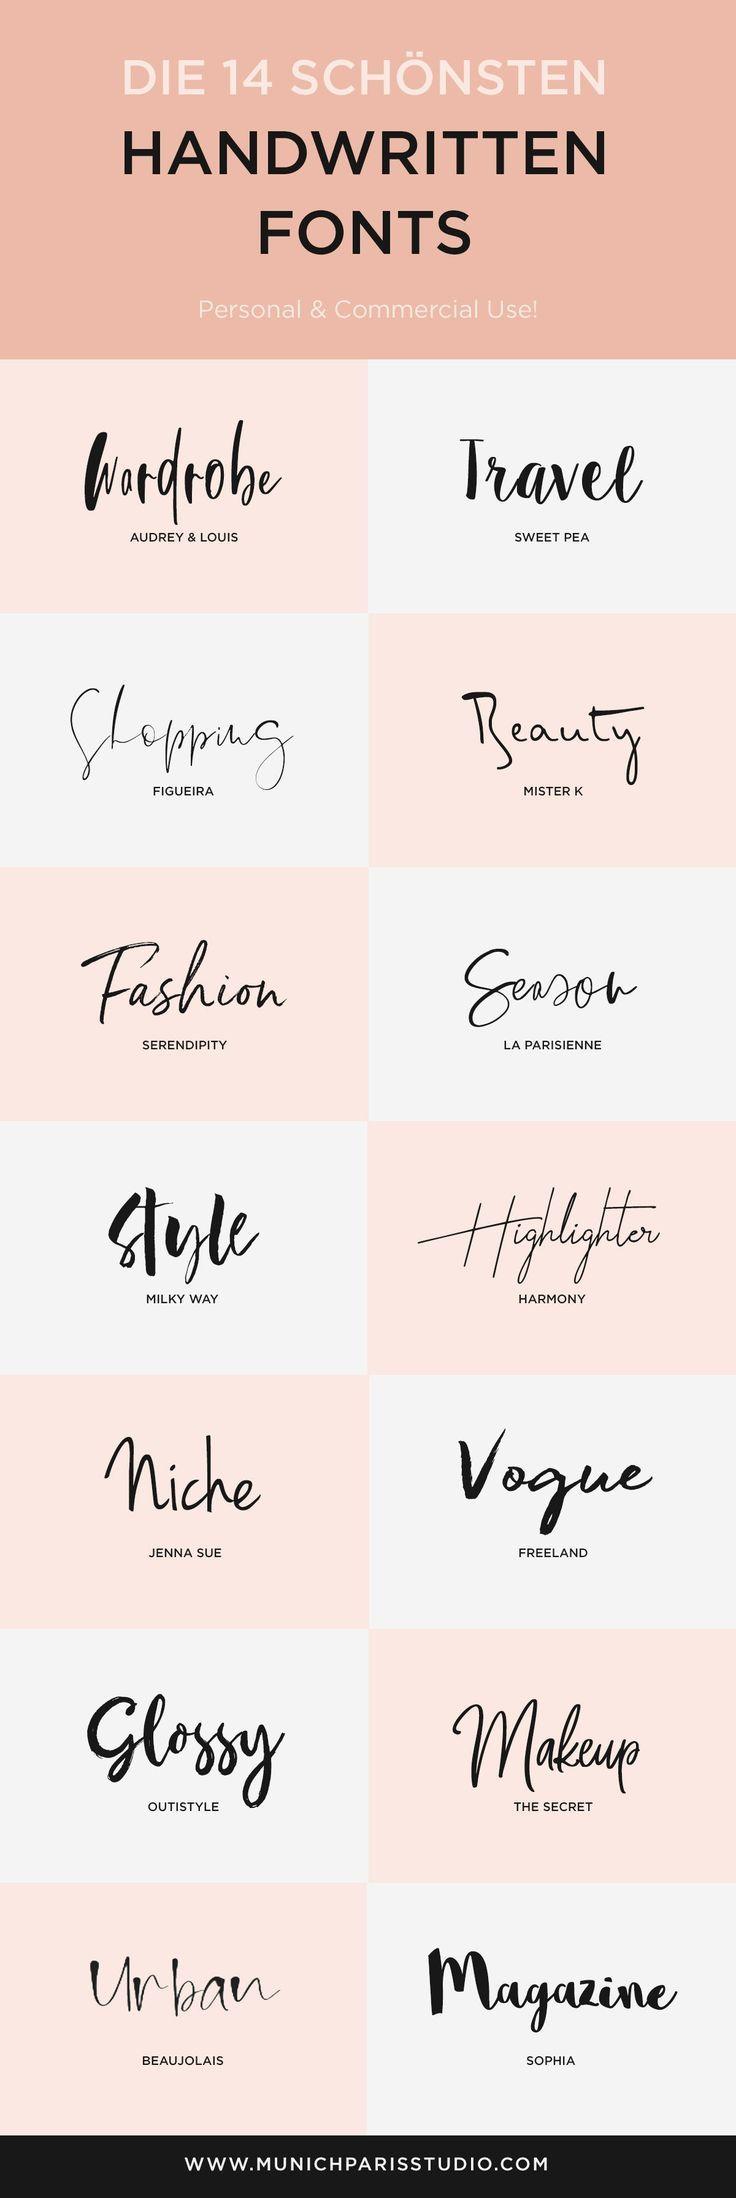 14 Beautiful Hand-Lettered Fonts for Logo & Branding | MunichParis Studio